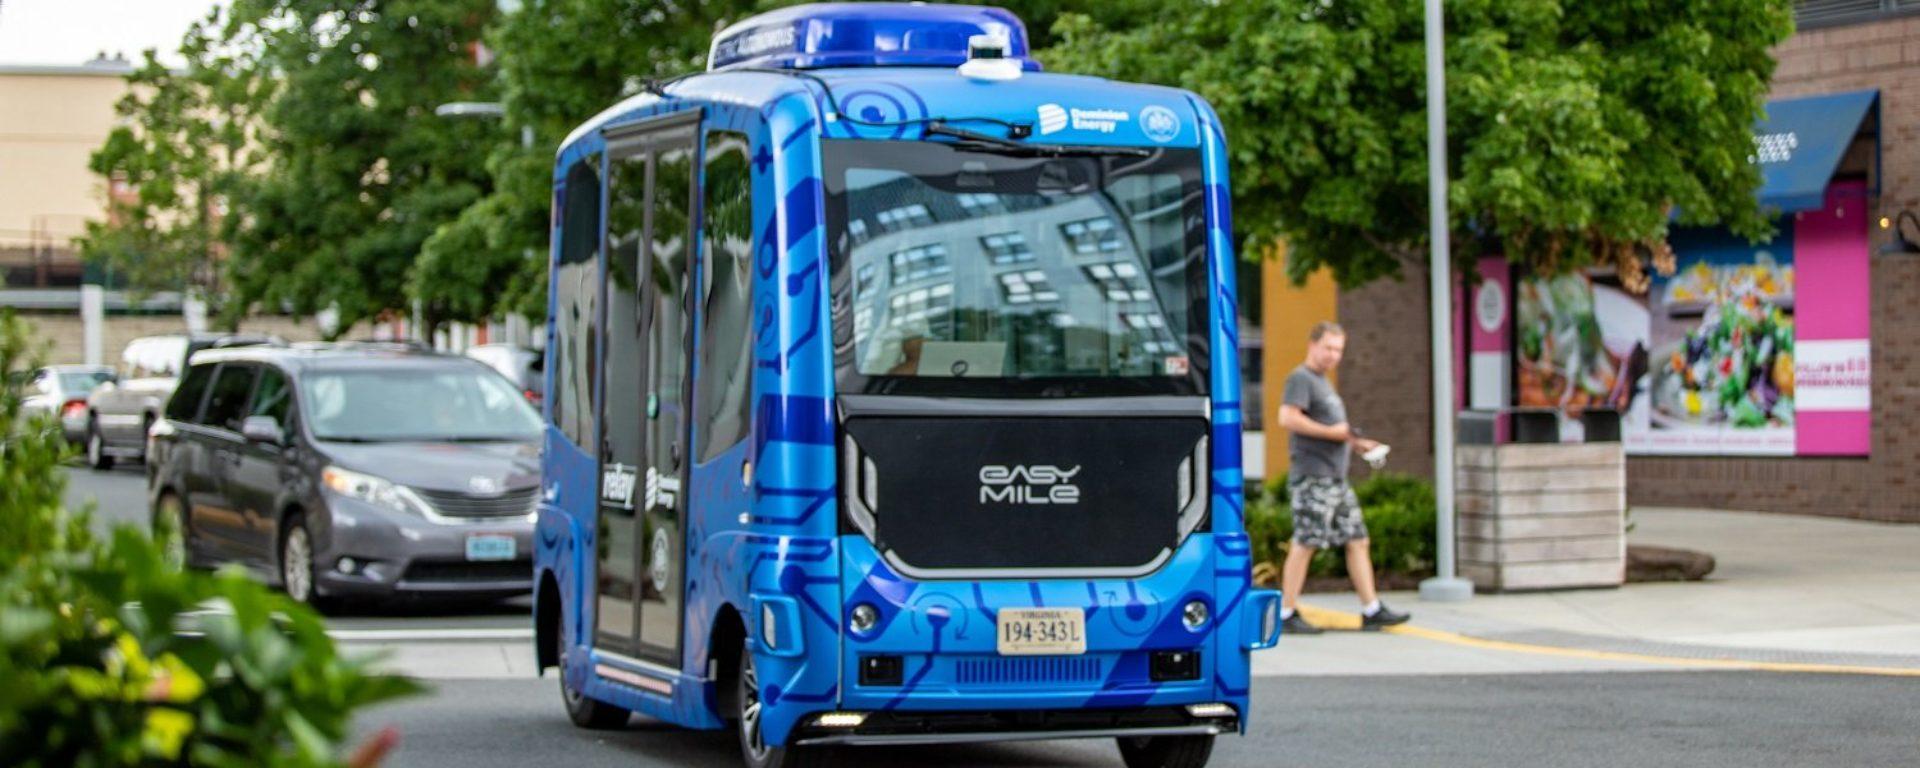 etats-unis-vehicules-autonomes